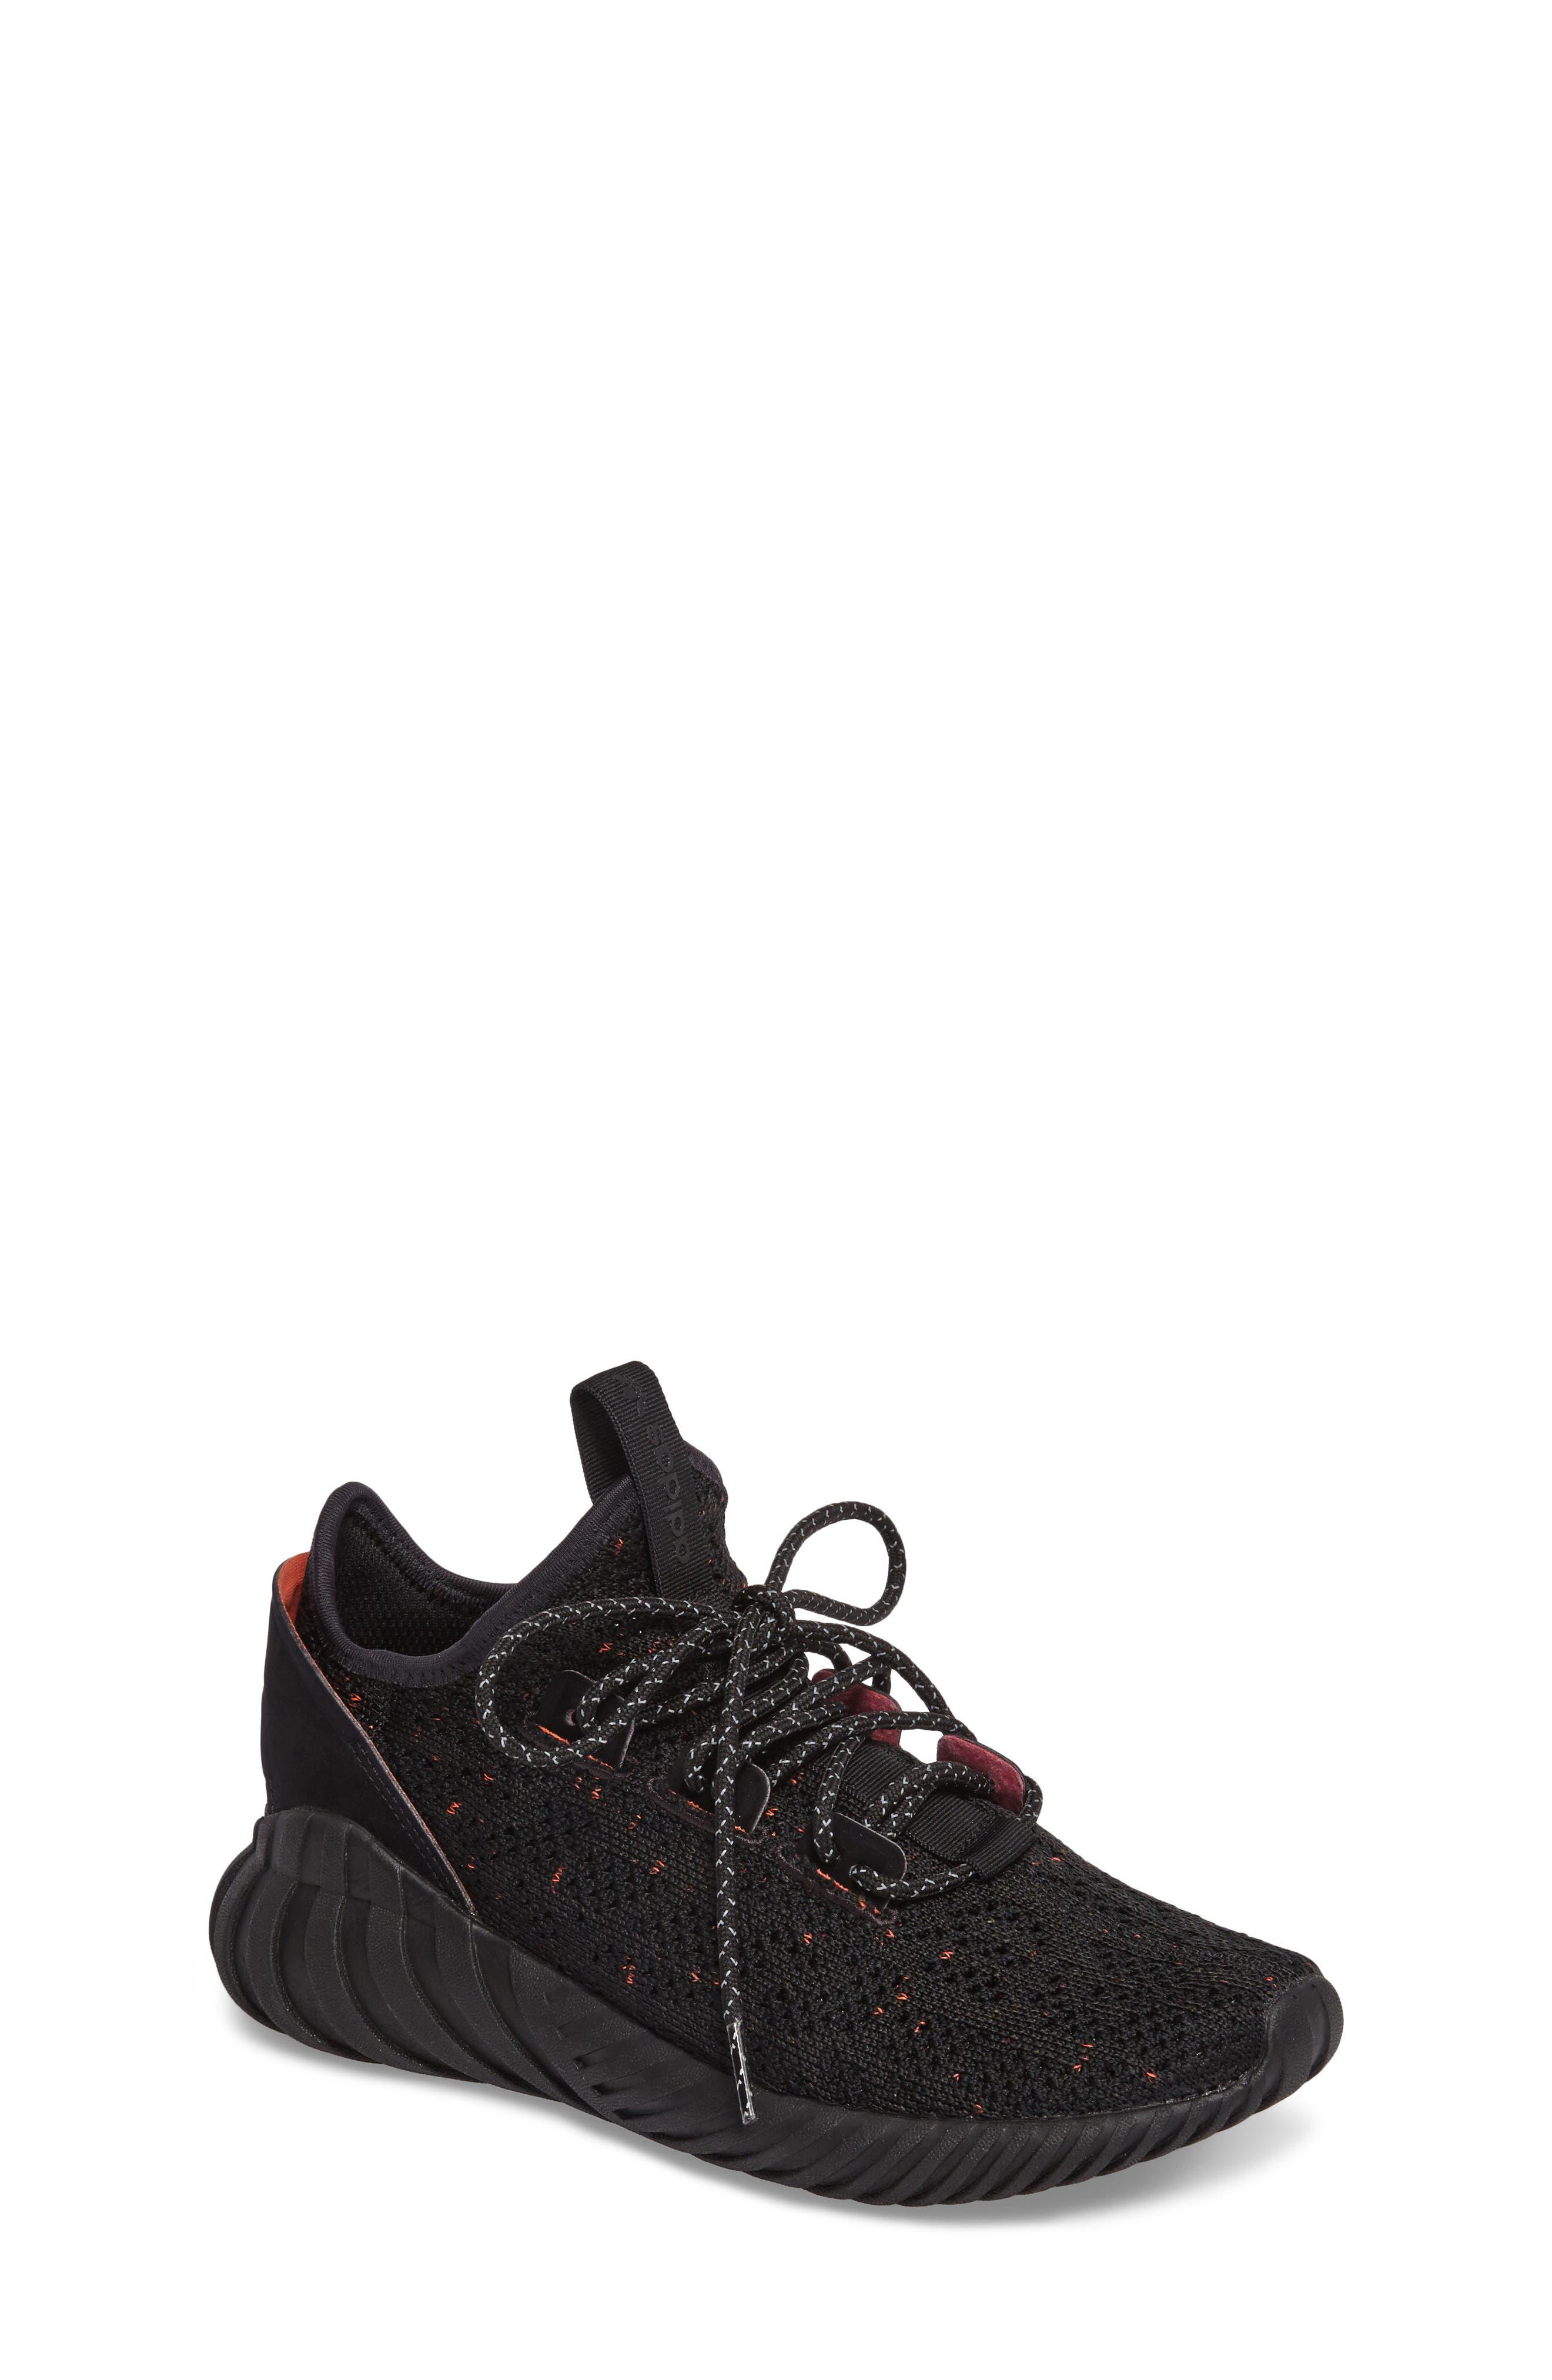 adidas Tubular Doom Primeknit Sneaker (Big Kid)